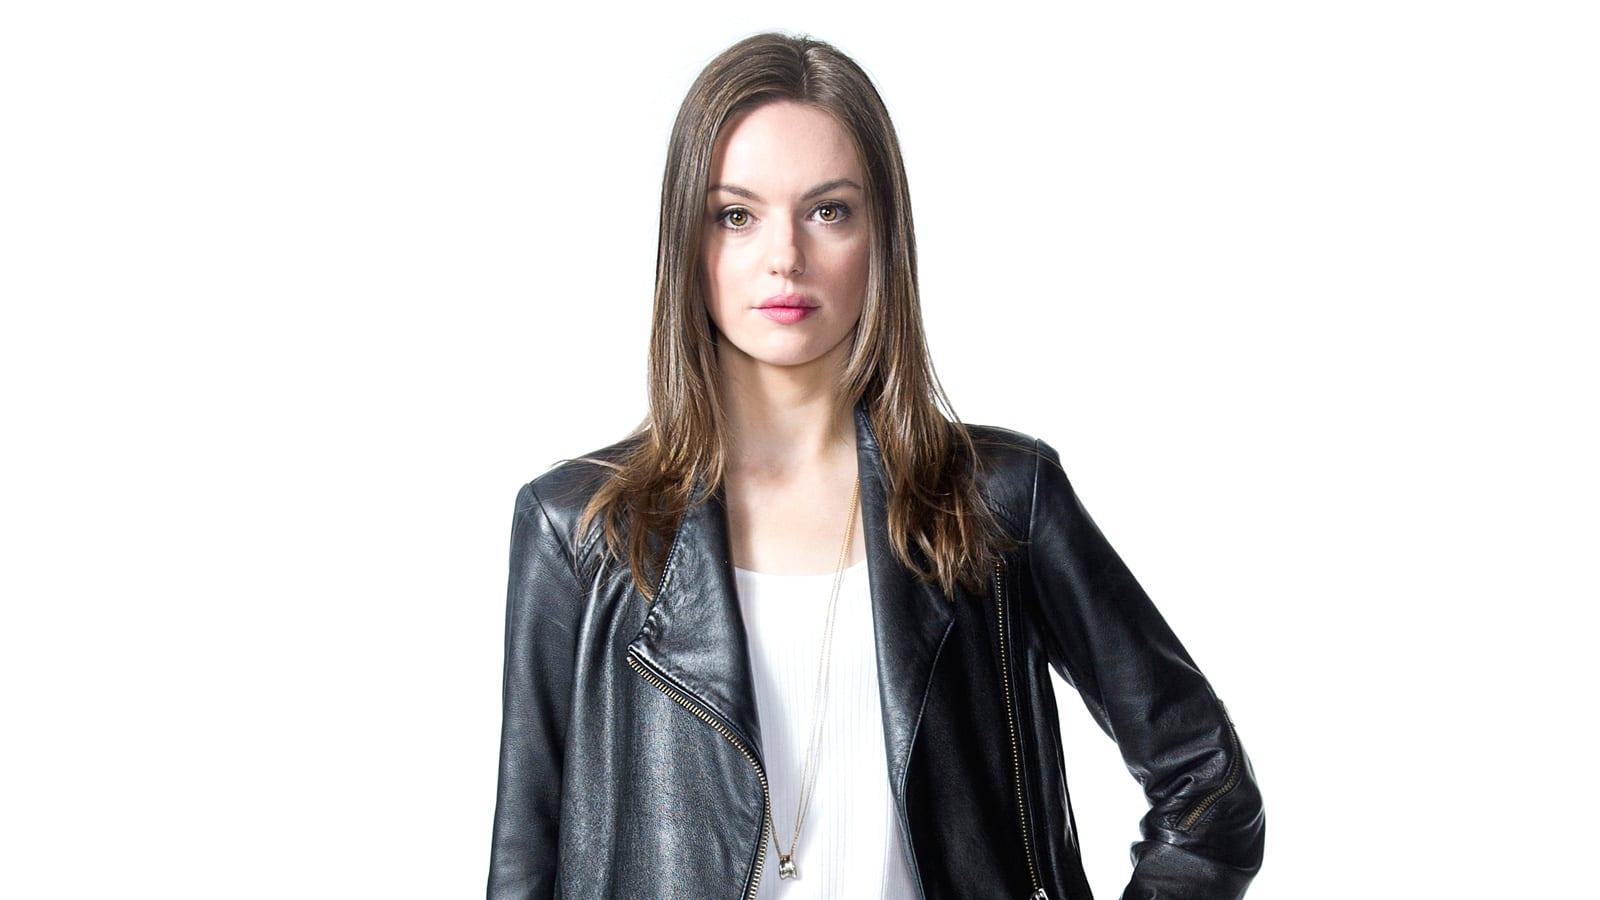 Michelle Mylett